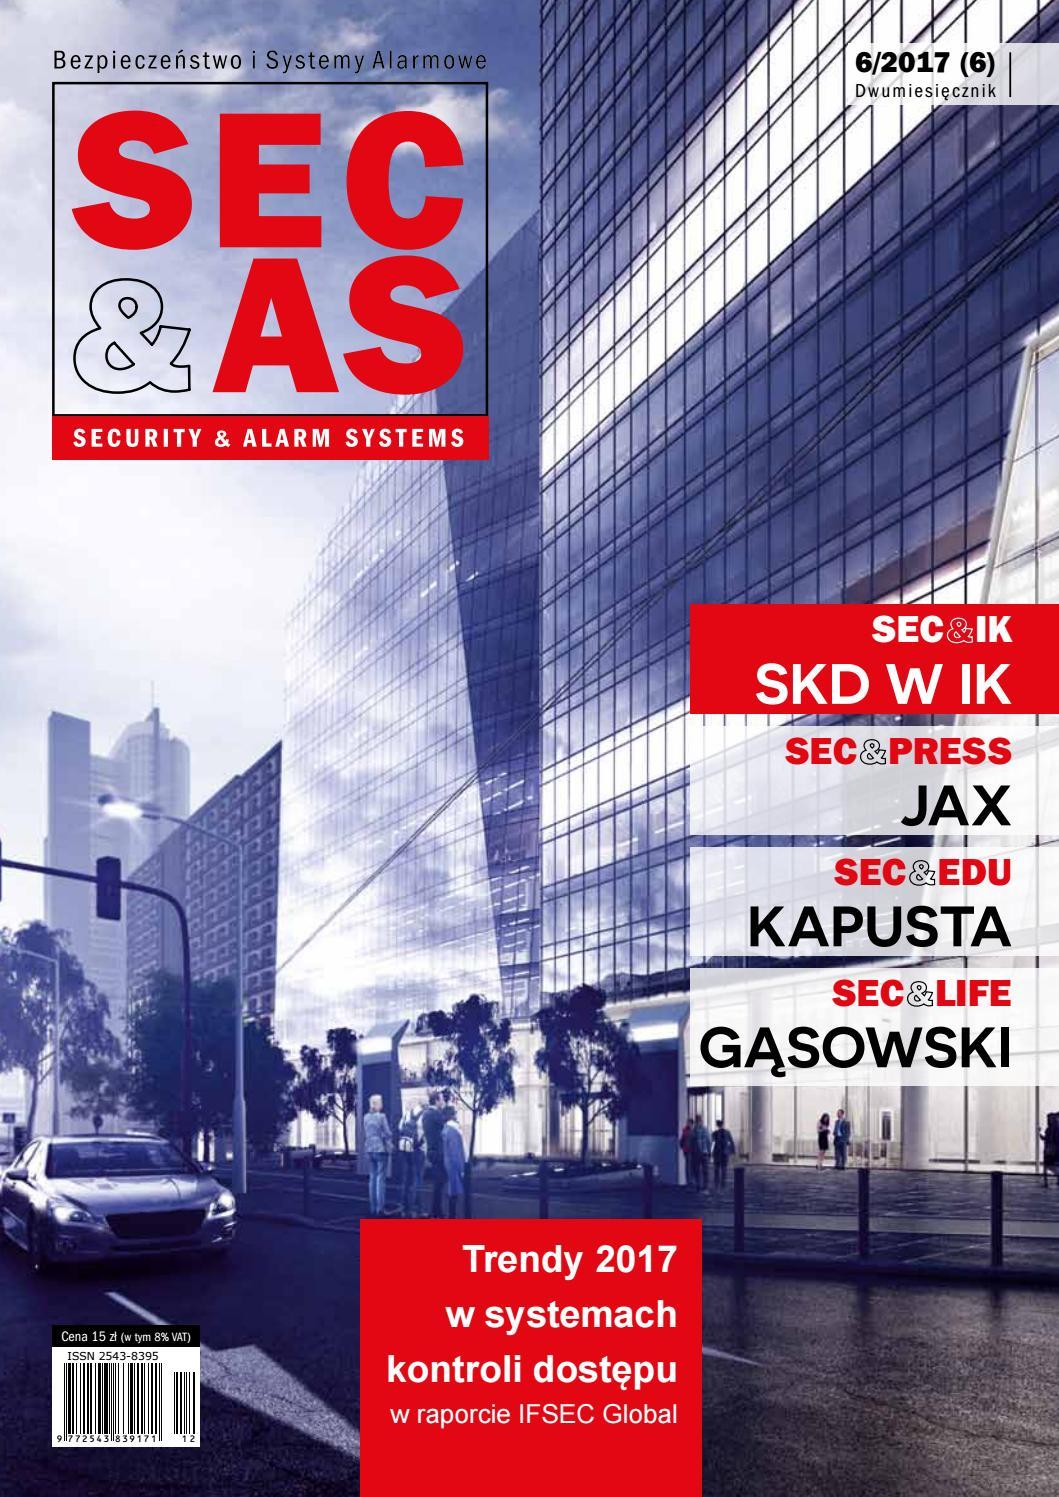 a26b392e950ca SEC&AS (SECURITY & ALARM SYSTEMS) 6/2017 (6) by PISA (Polska Izba Systemów  Alarmowych) - issuu